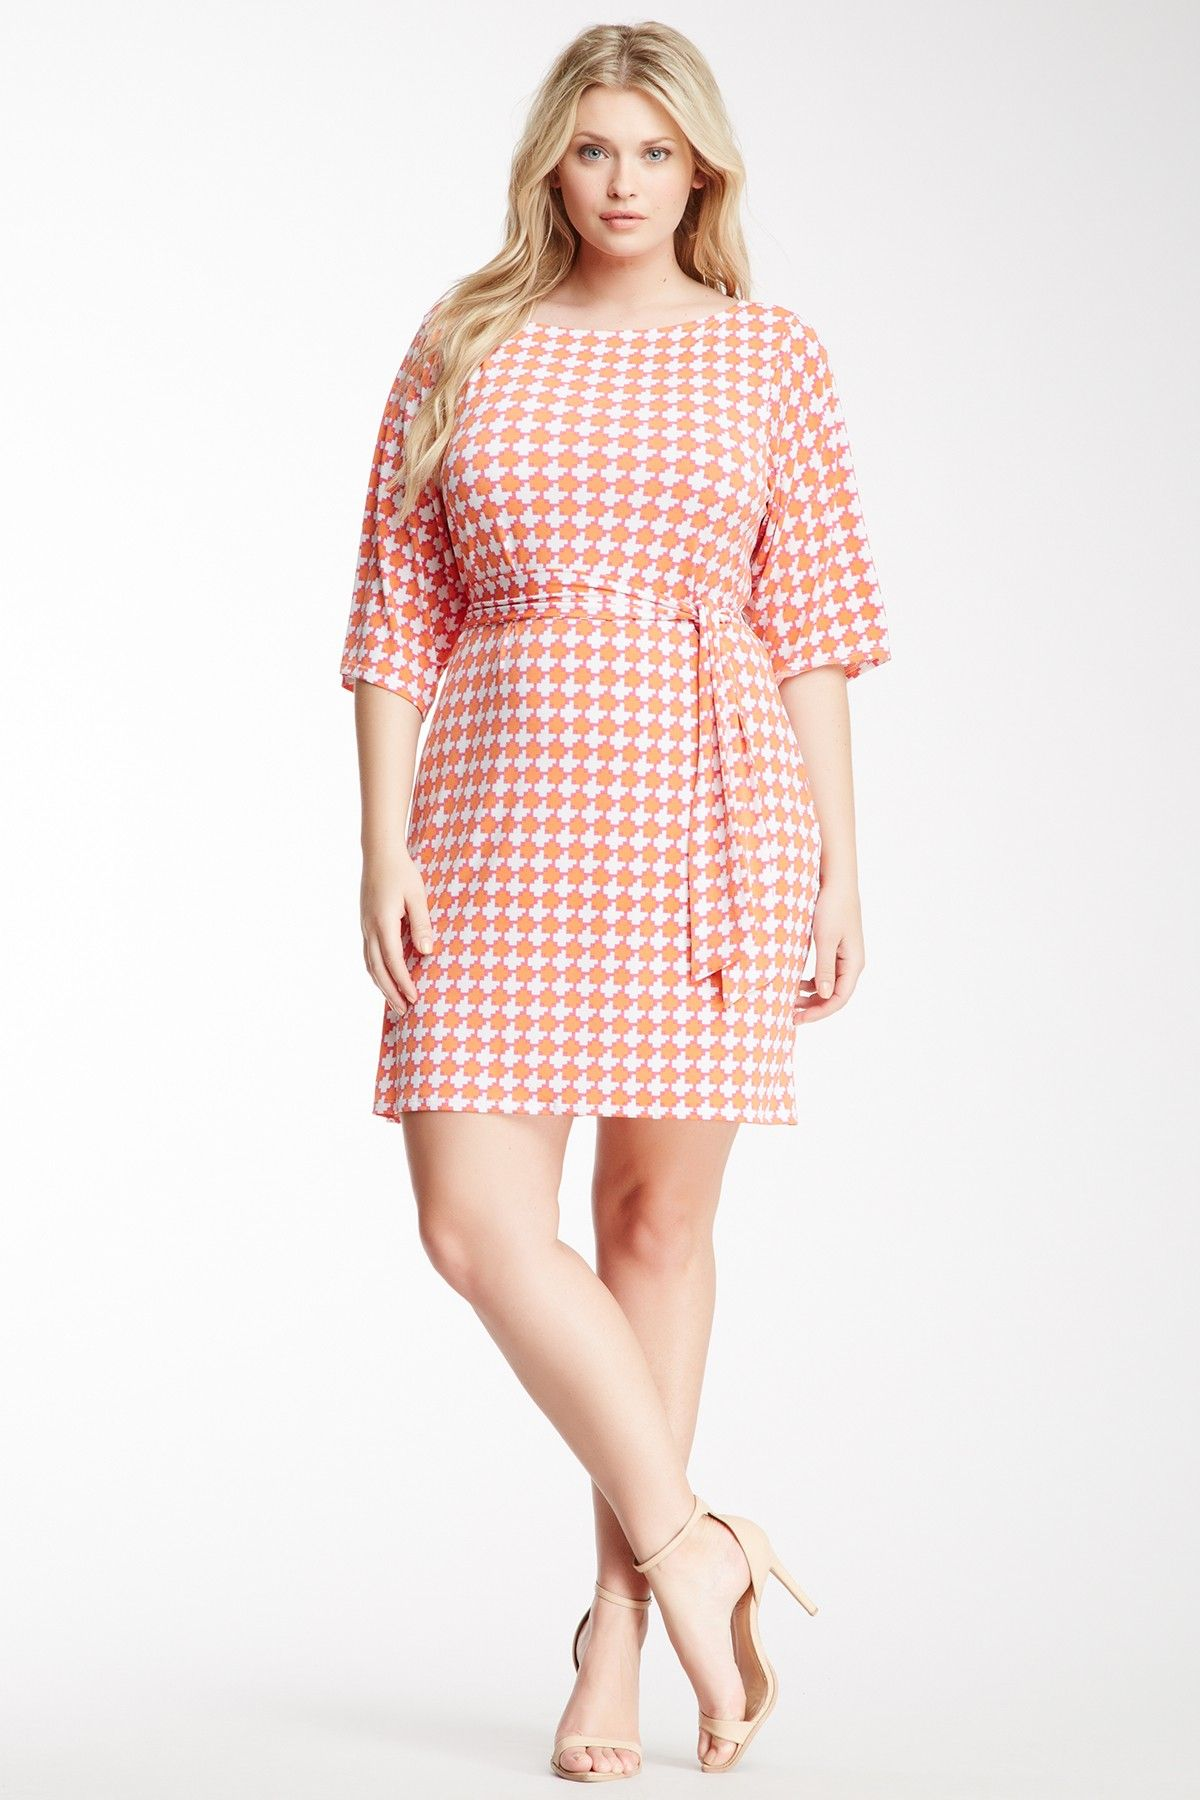 Printed Sheath Dress - Plus Size | Moda vestidos, Costura y Ropa